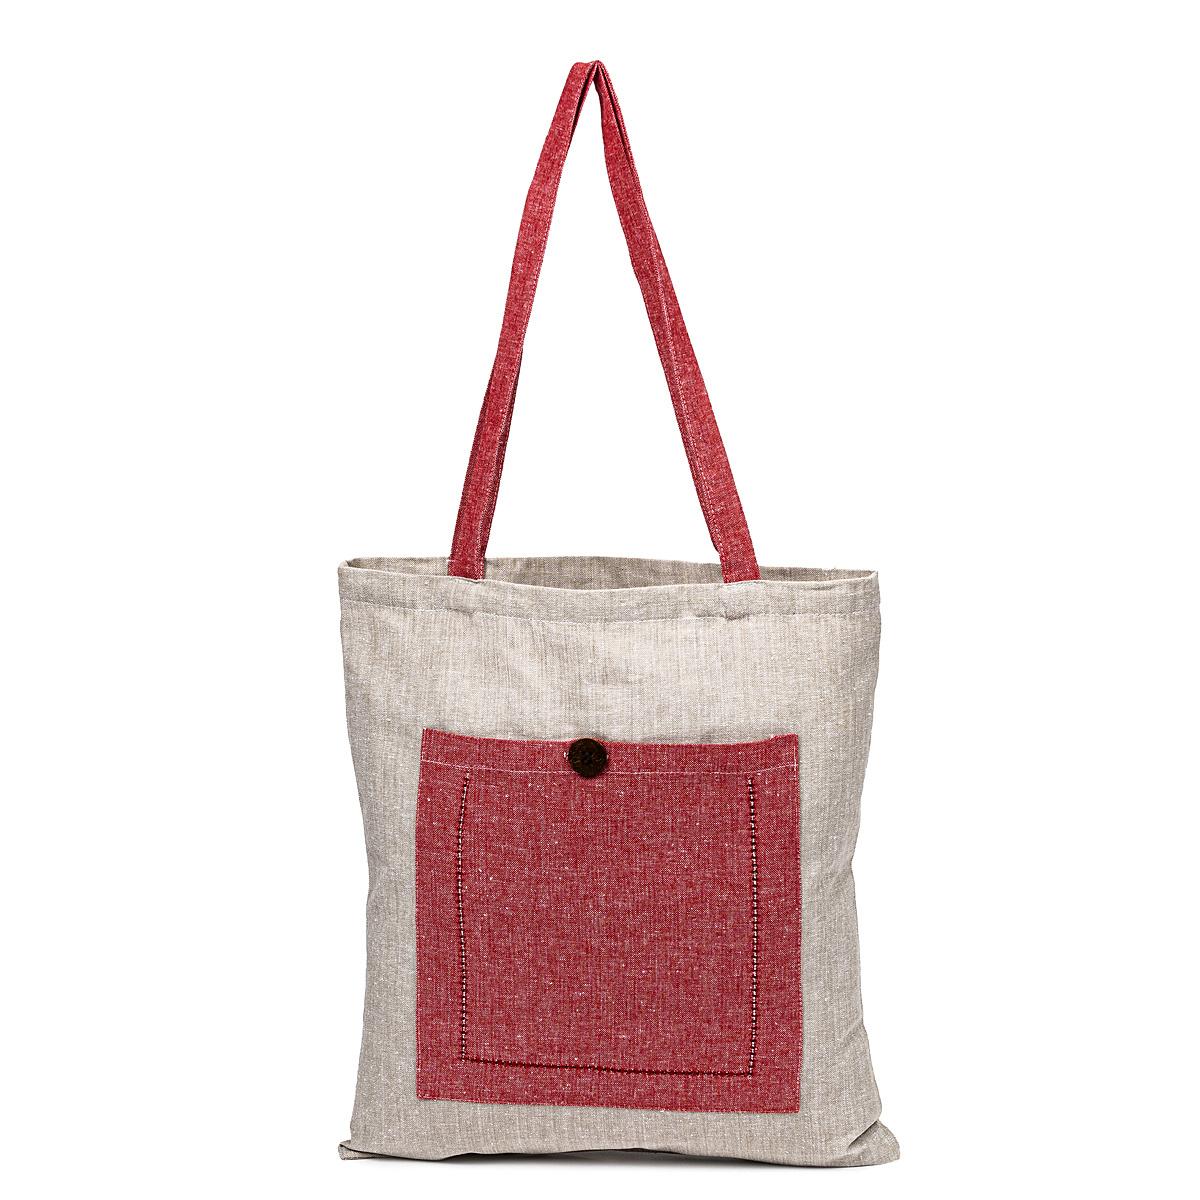 Trade Concept Nákupná taška Heda červená / béžová, 40 x 45 cm